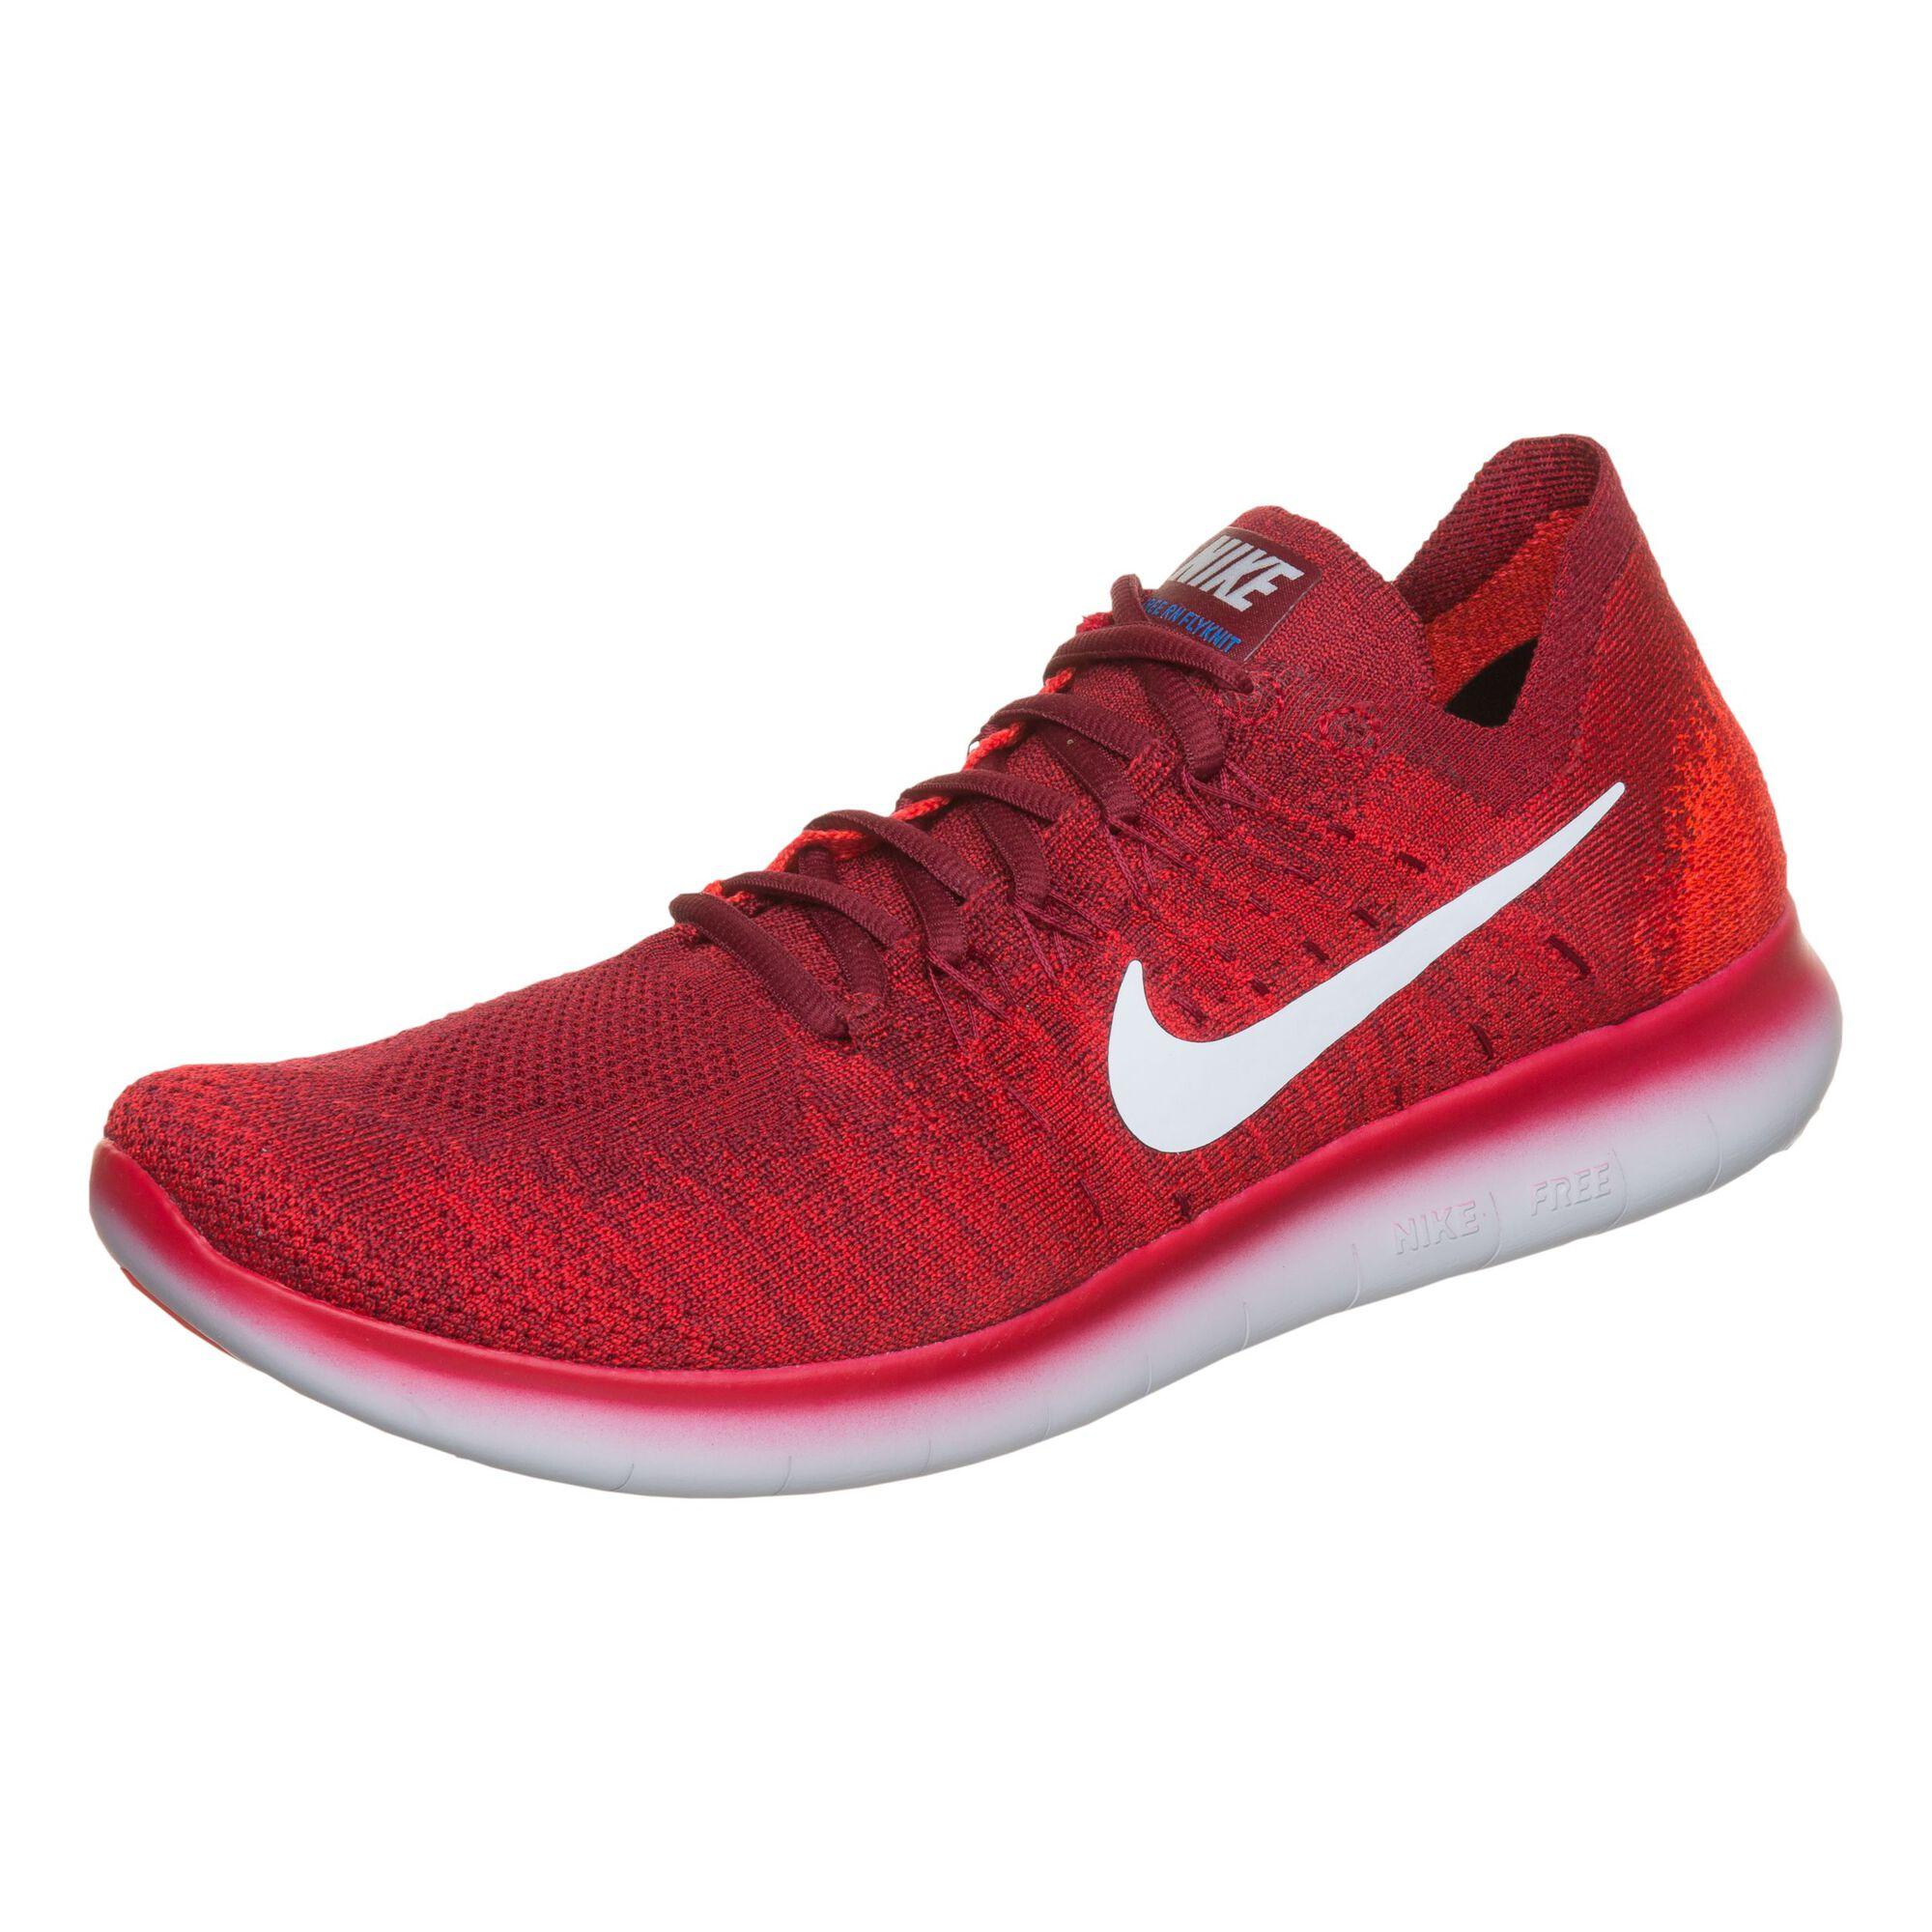 new concept 109c3 e8a48 Nike · Nike · Nike · Nike · Nike · Nike · Nike · Nike · Nike · Nike. Free  Run Flyknit 2017 ...